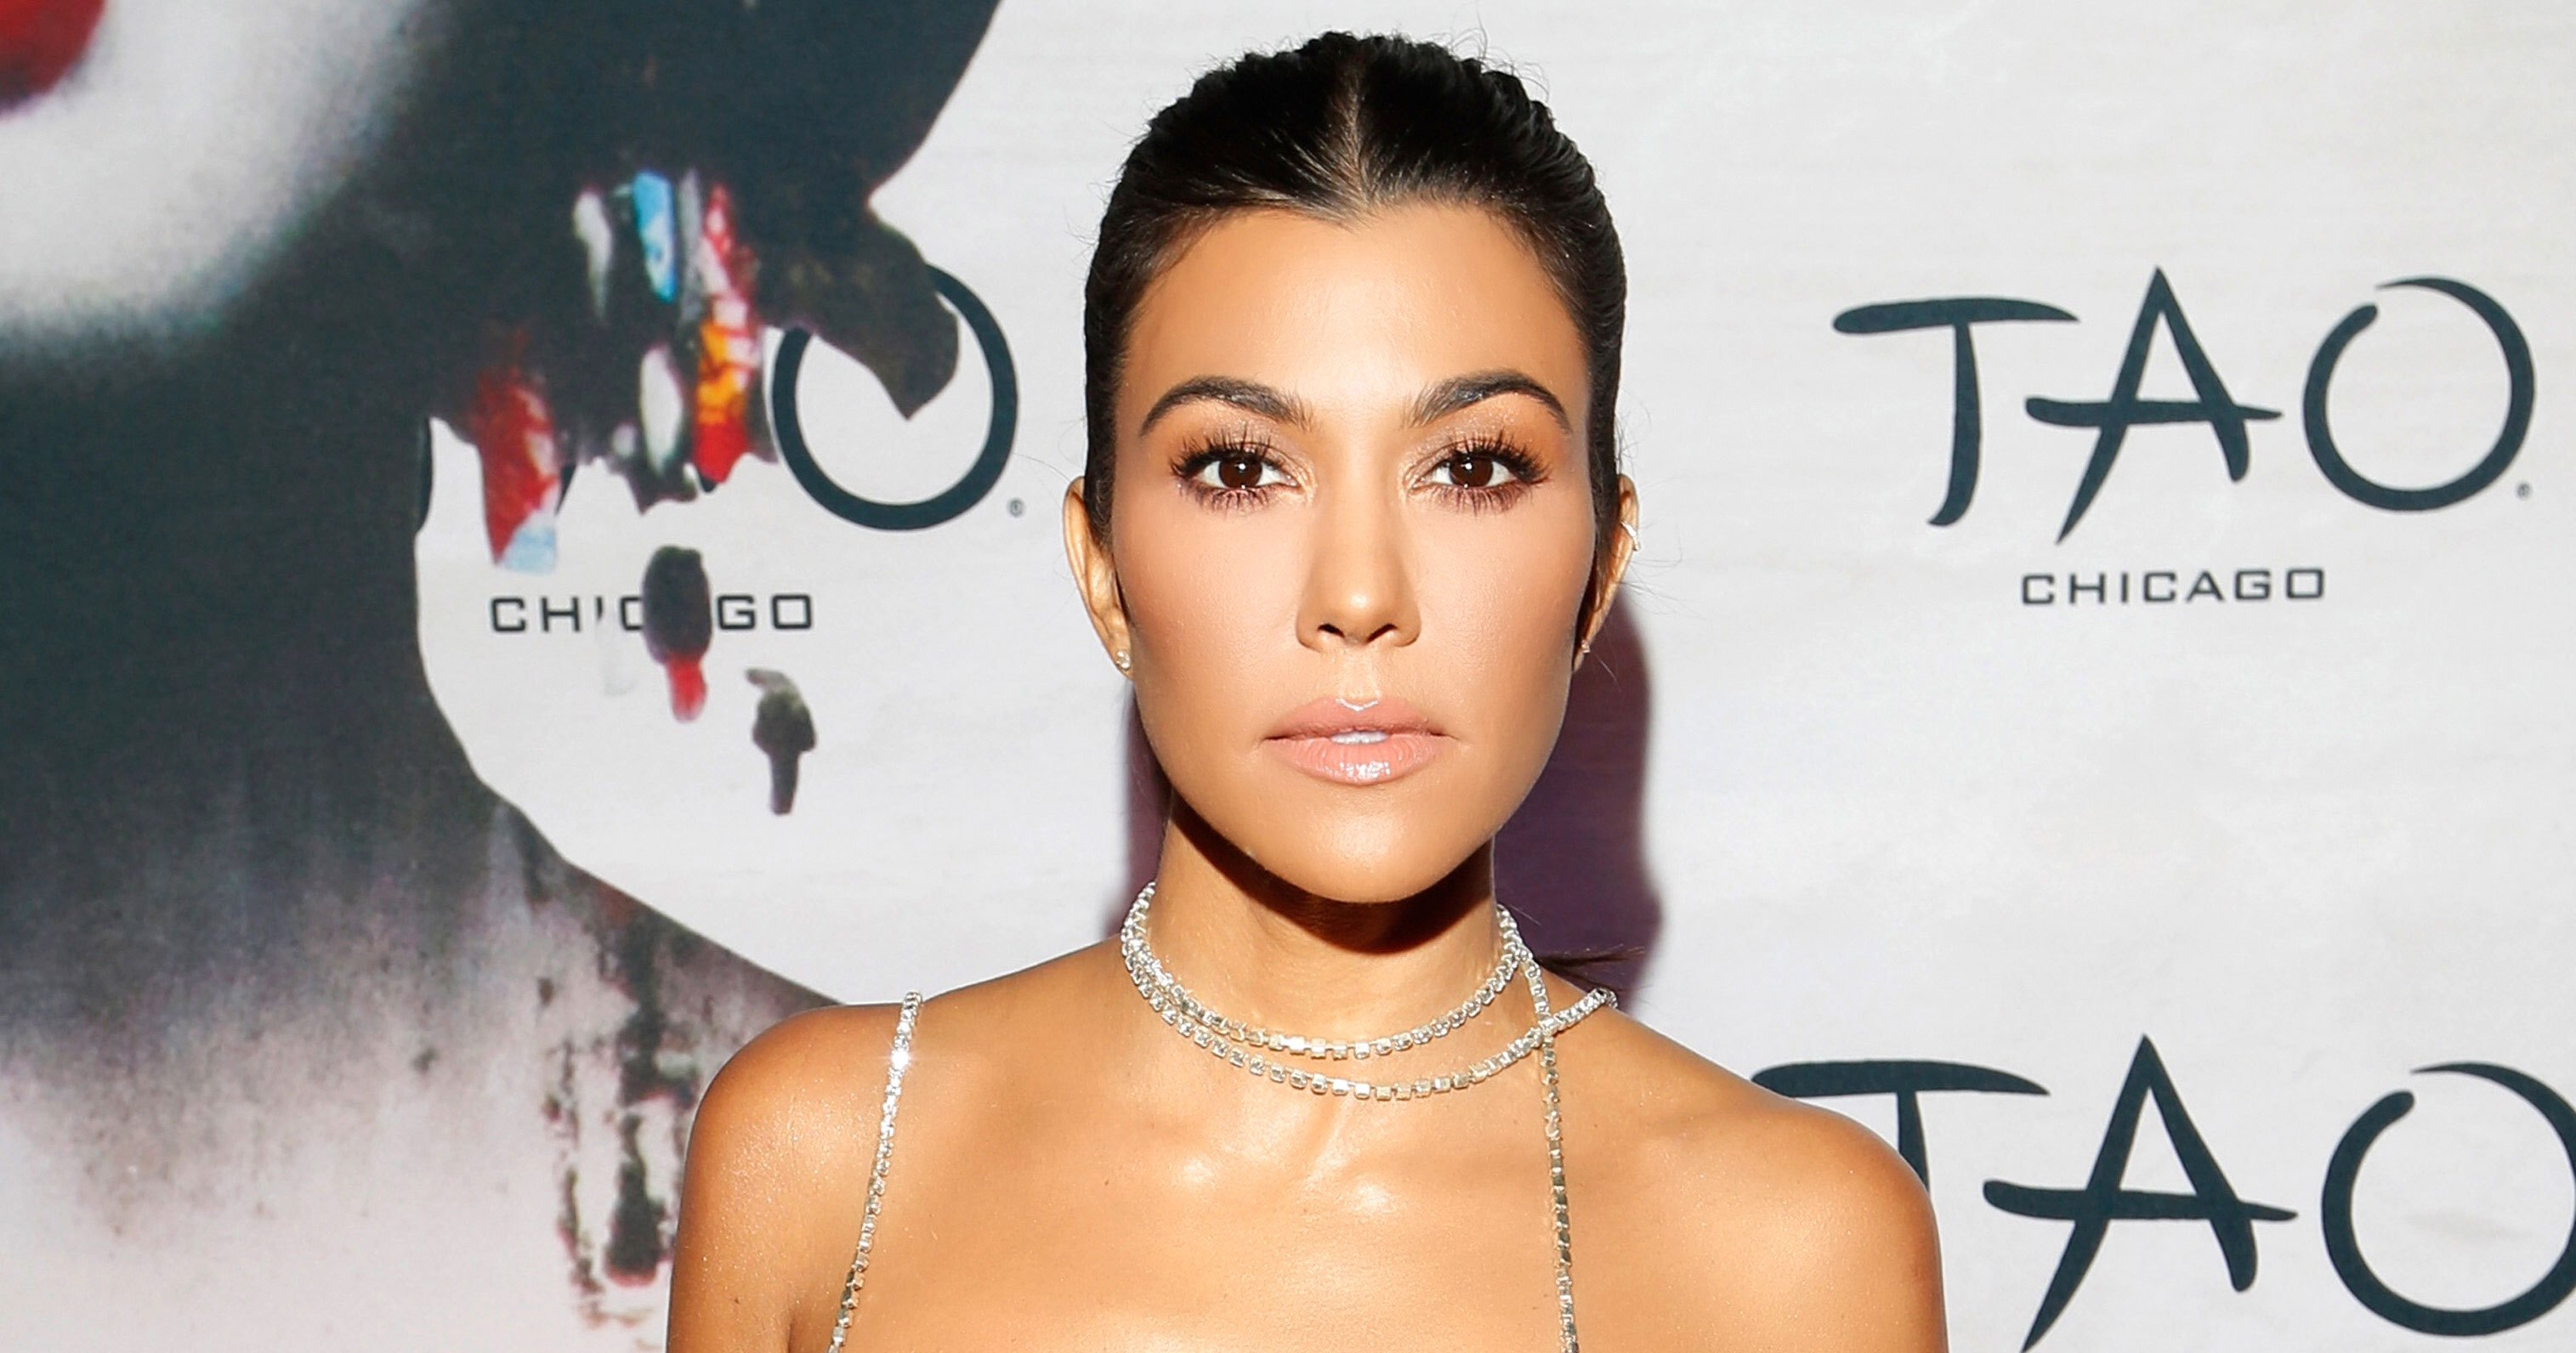 See Ya! Kourtney Kardashian Bans Plastic Water Bottles From Her House